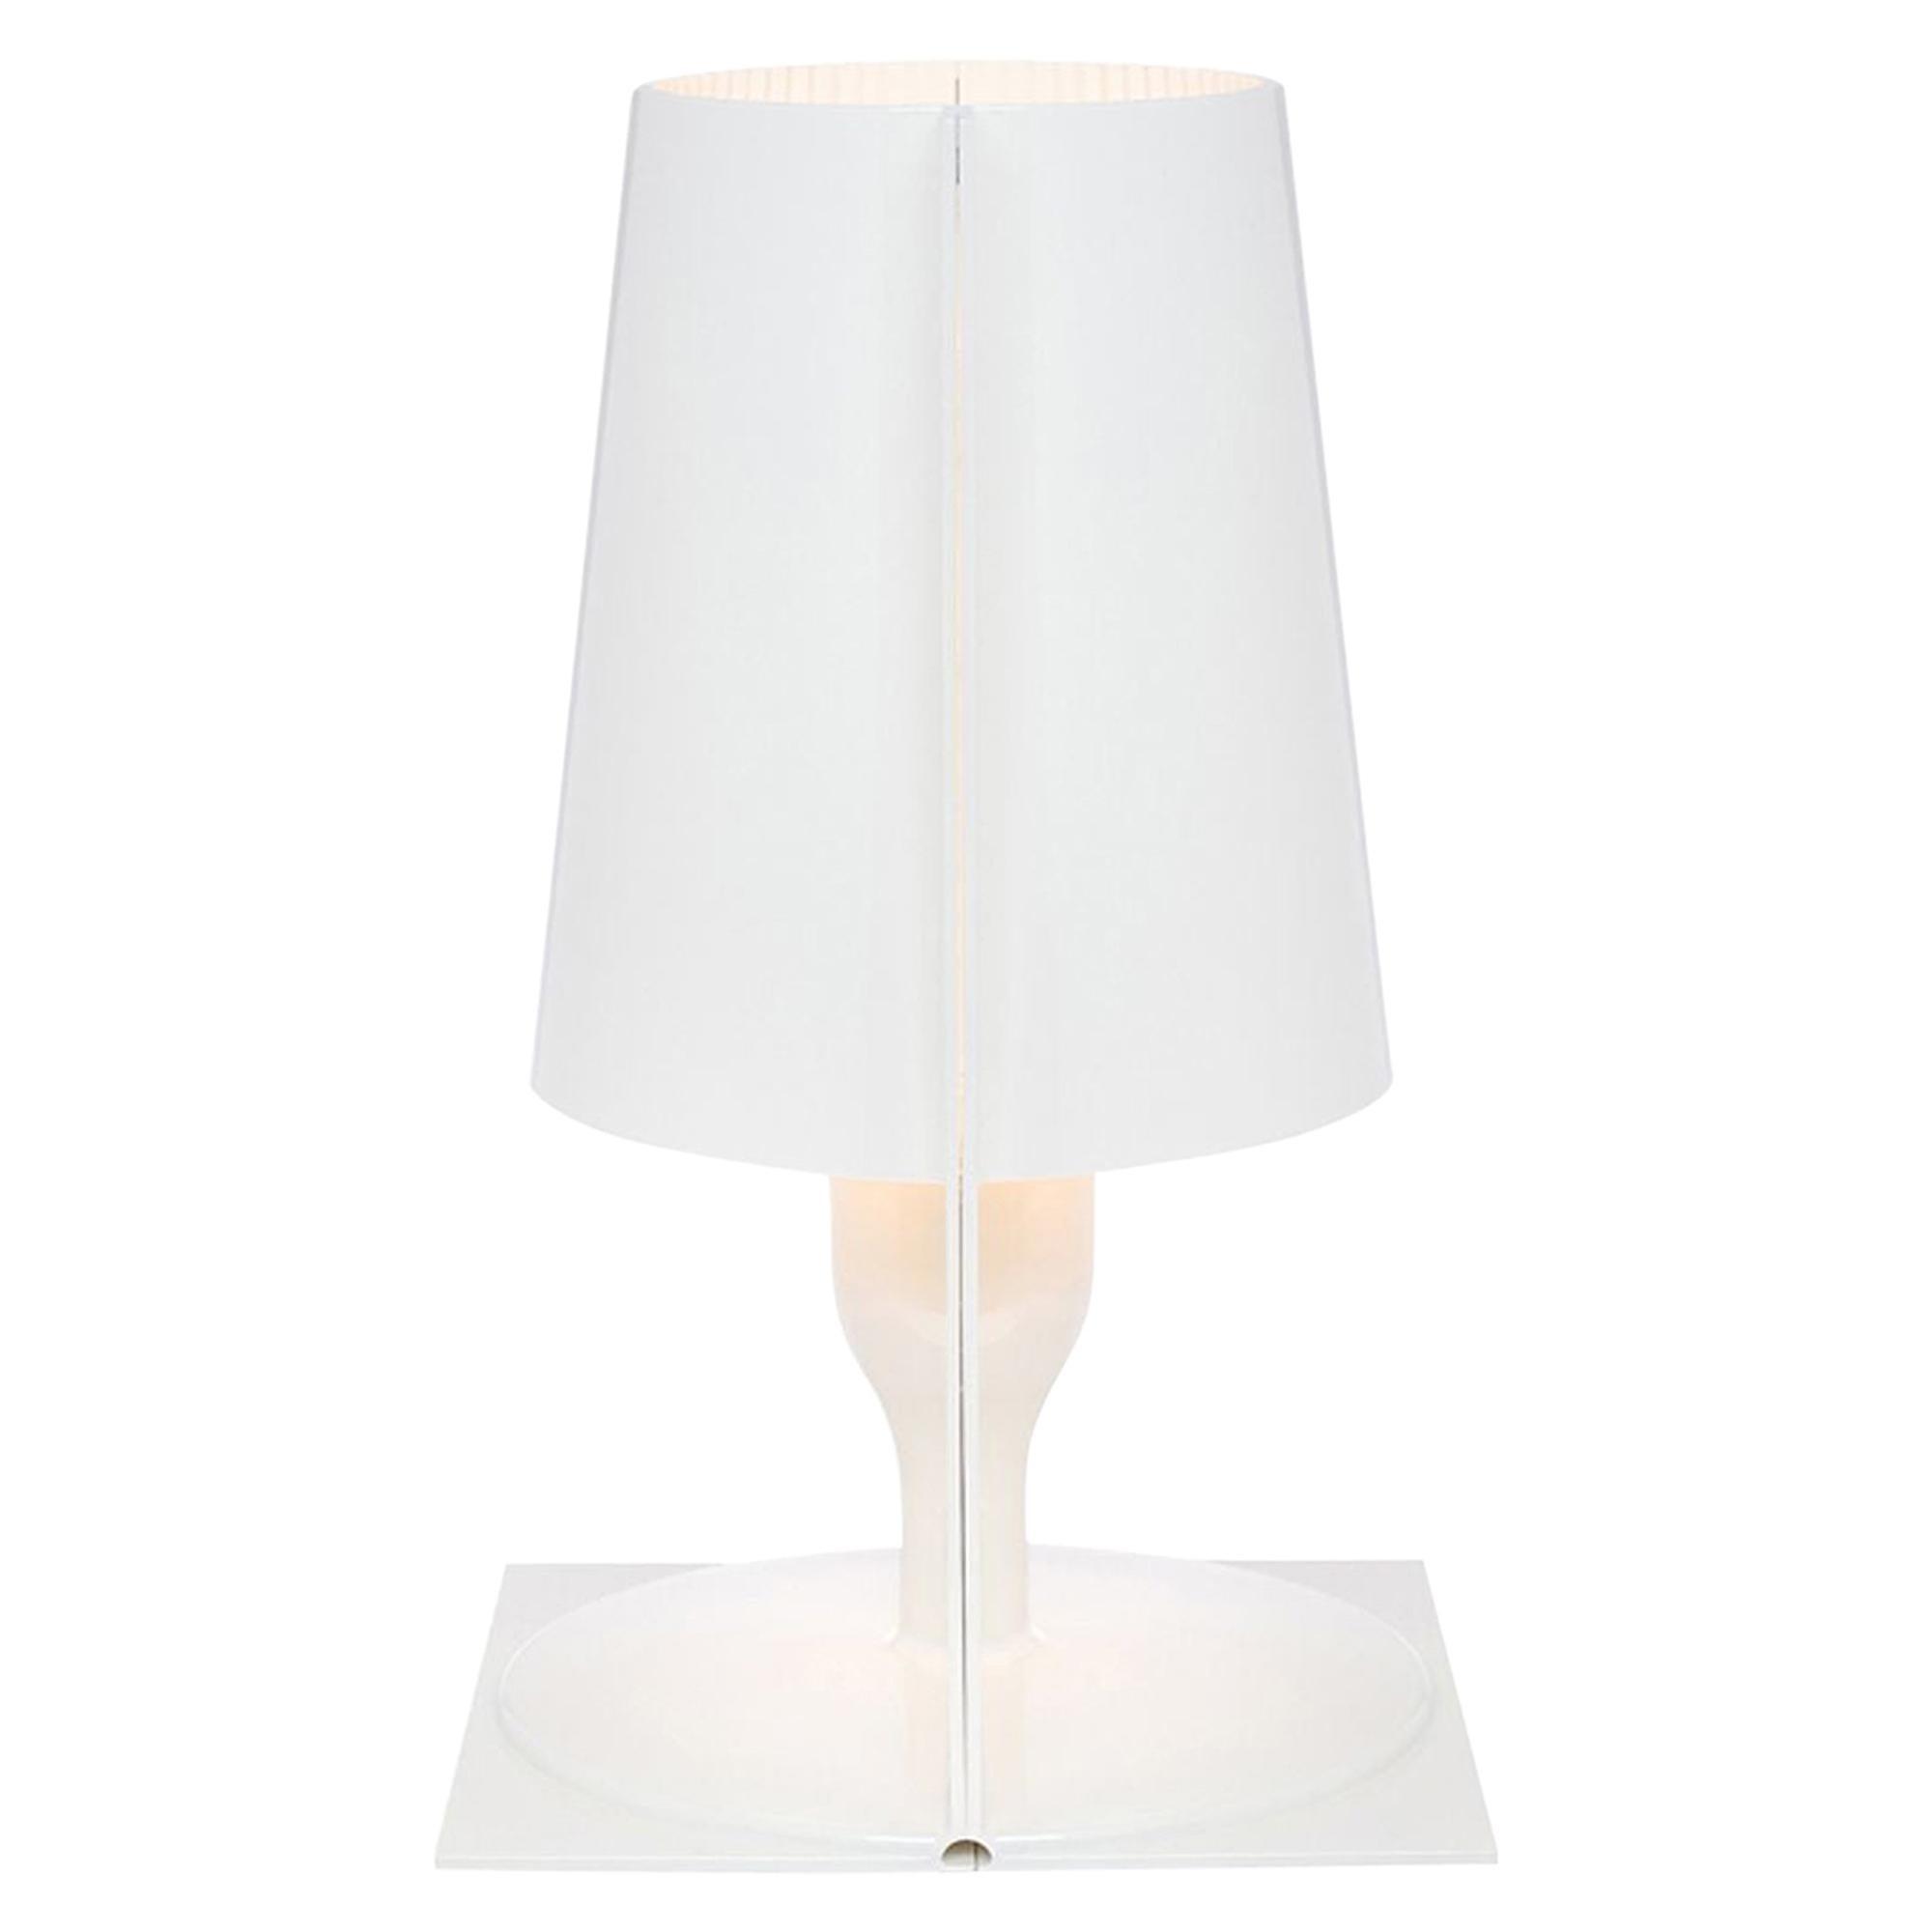 Kartell Take Lamp in Solid White by Ferruccio Laviani